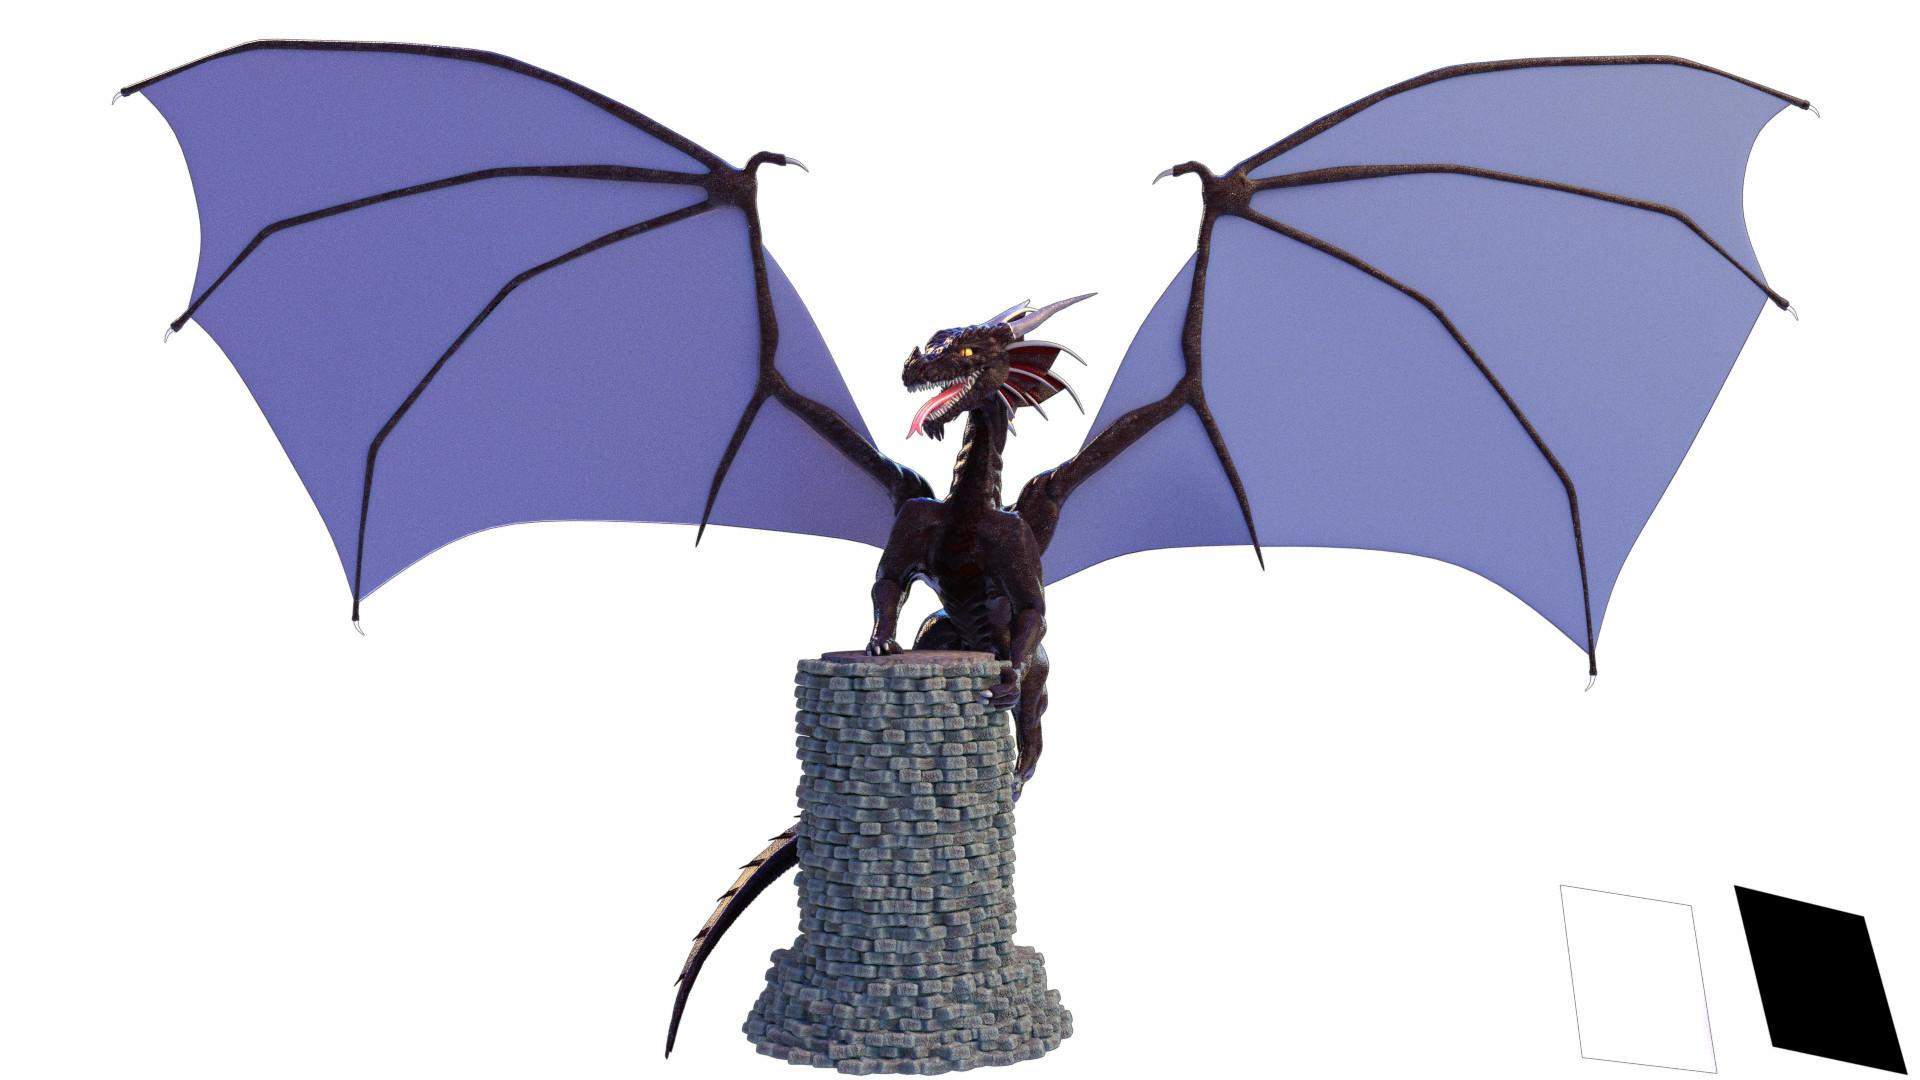 Julian granke drake previsualisierung 4